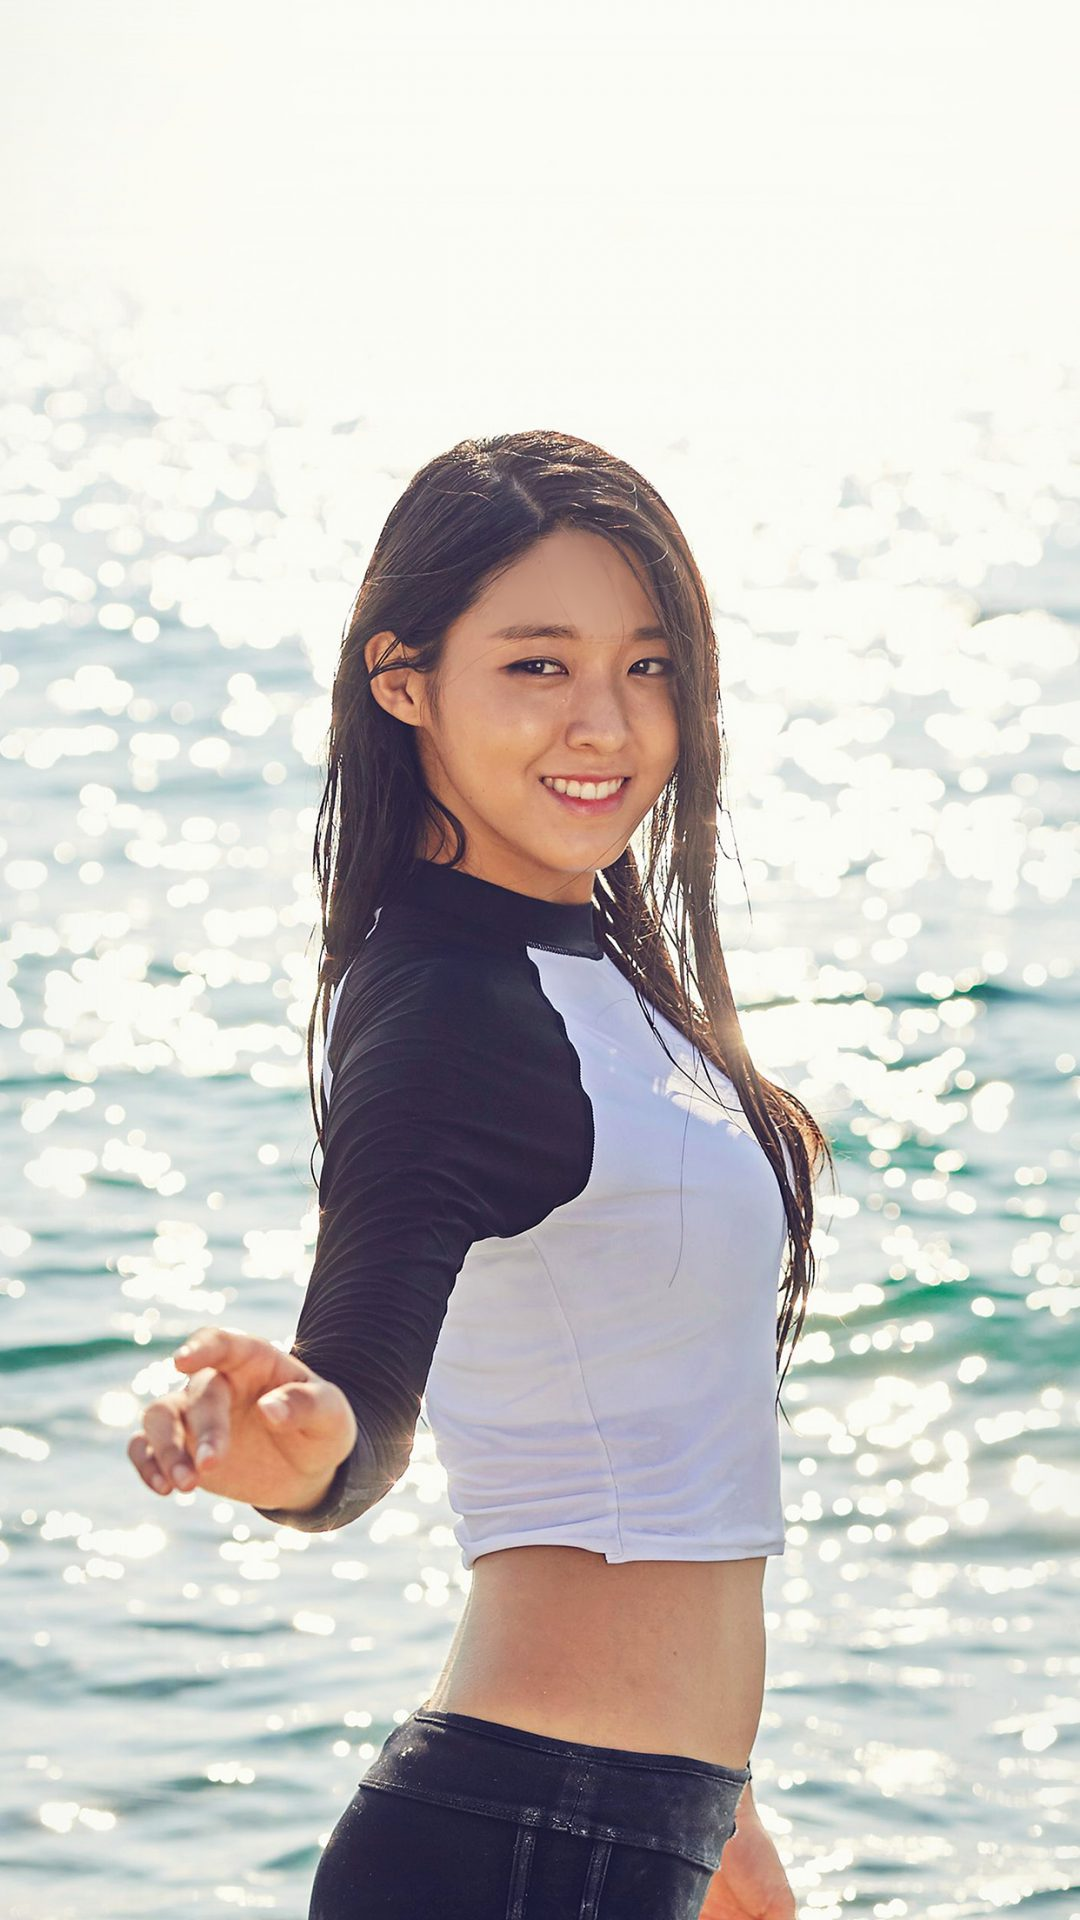 Seolhyun Kpop Aoa Girl Sea Cute